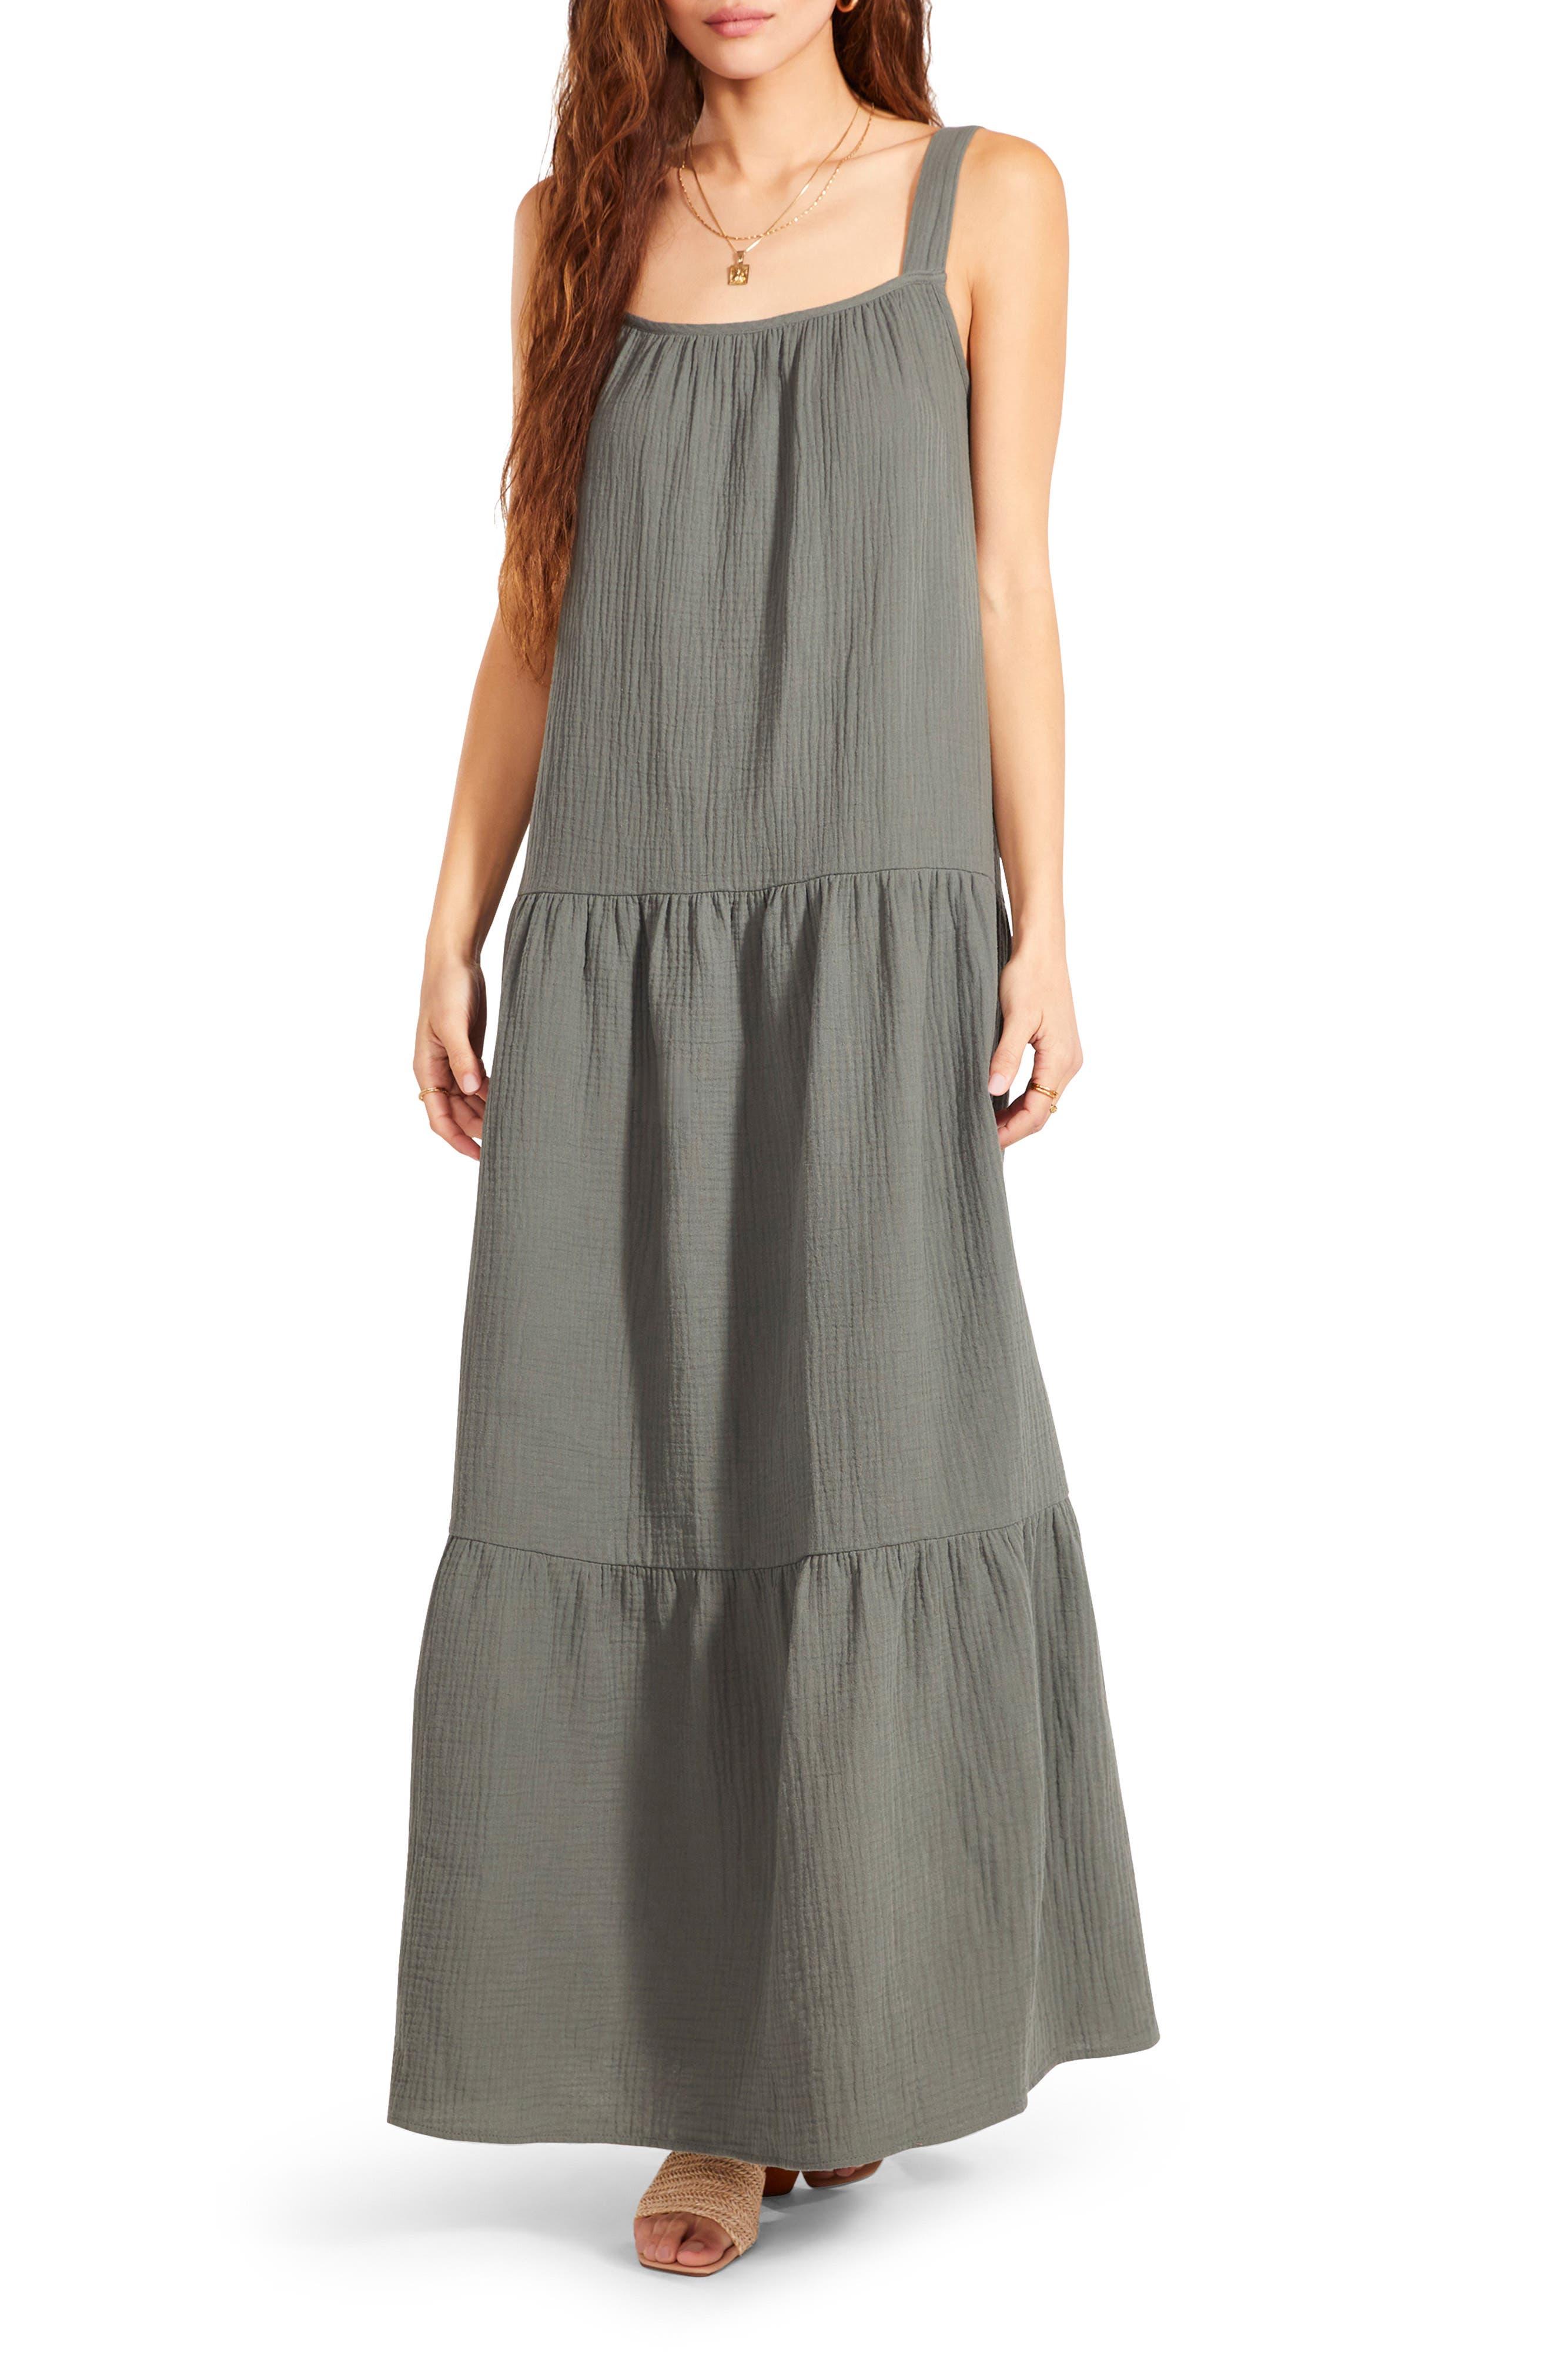 Bb Dakota ARIANNA SLEEVELESS TIERED MAXI DRESS